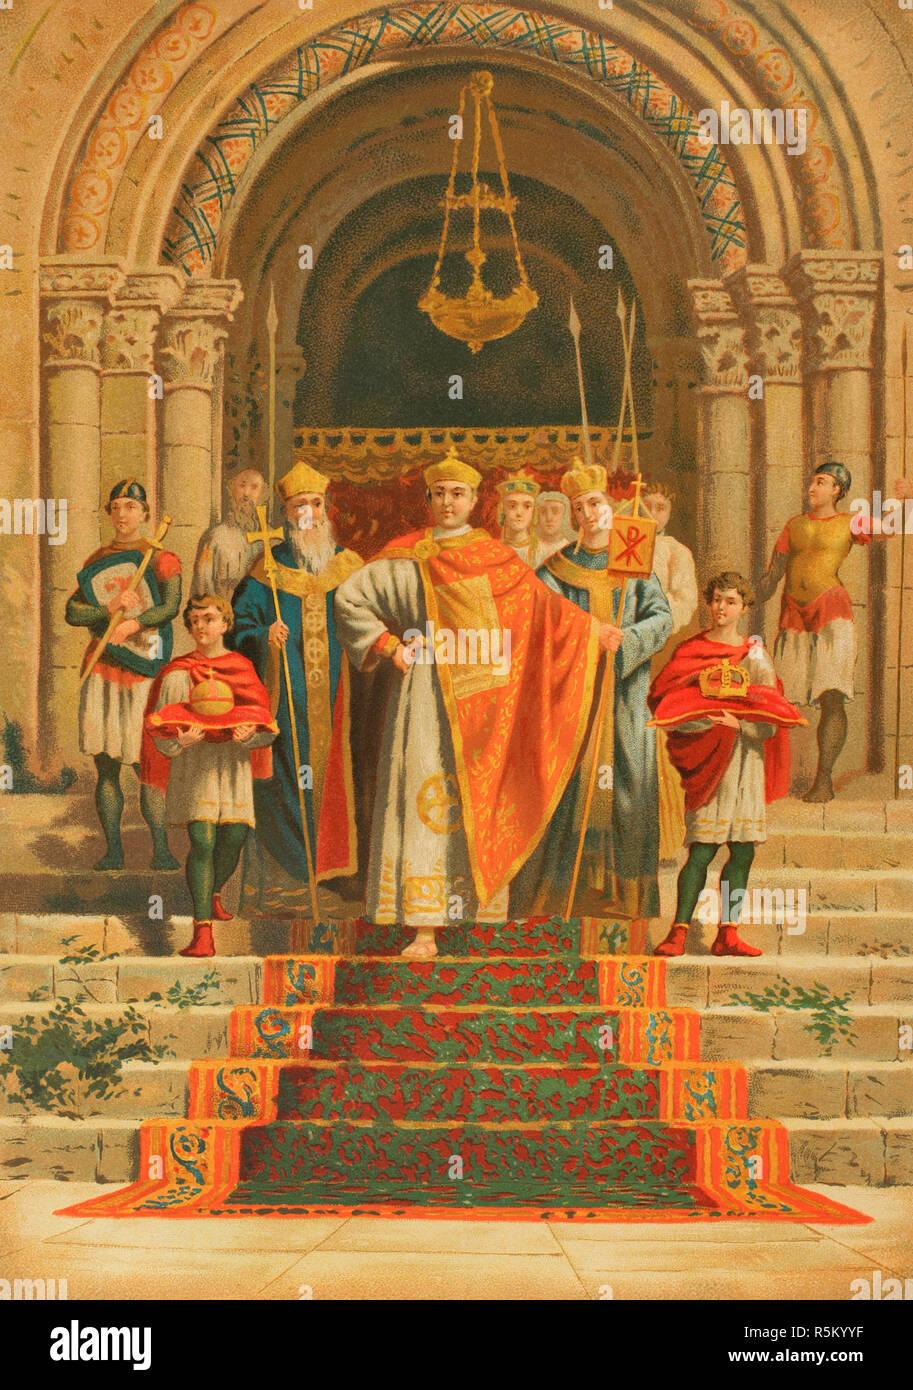 Arcadius (377-408). L'Est de l'empereur romain de 395 à 408. Arcadius apparaître en public. Lithography. La Civilizacion (la civilisation), volume III, 1882. Photo Stock